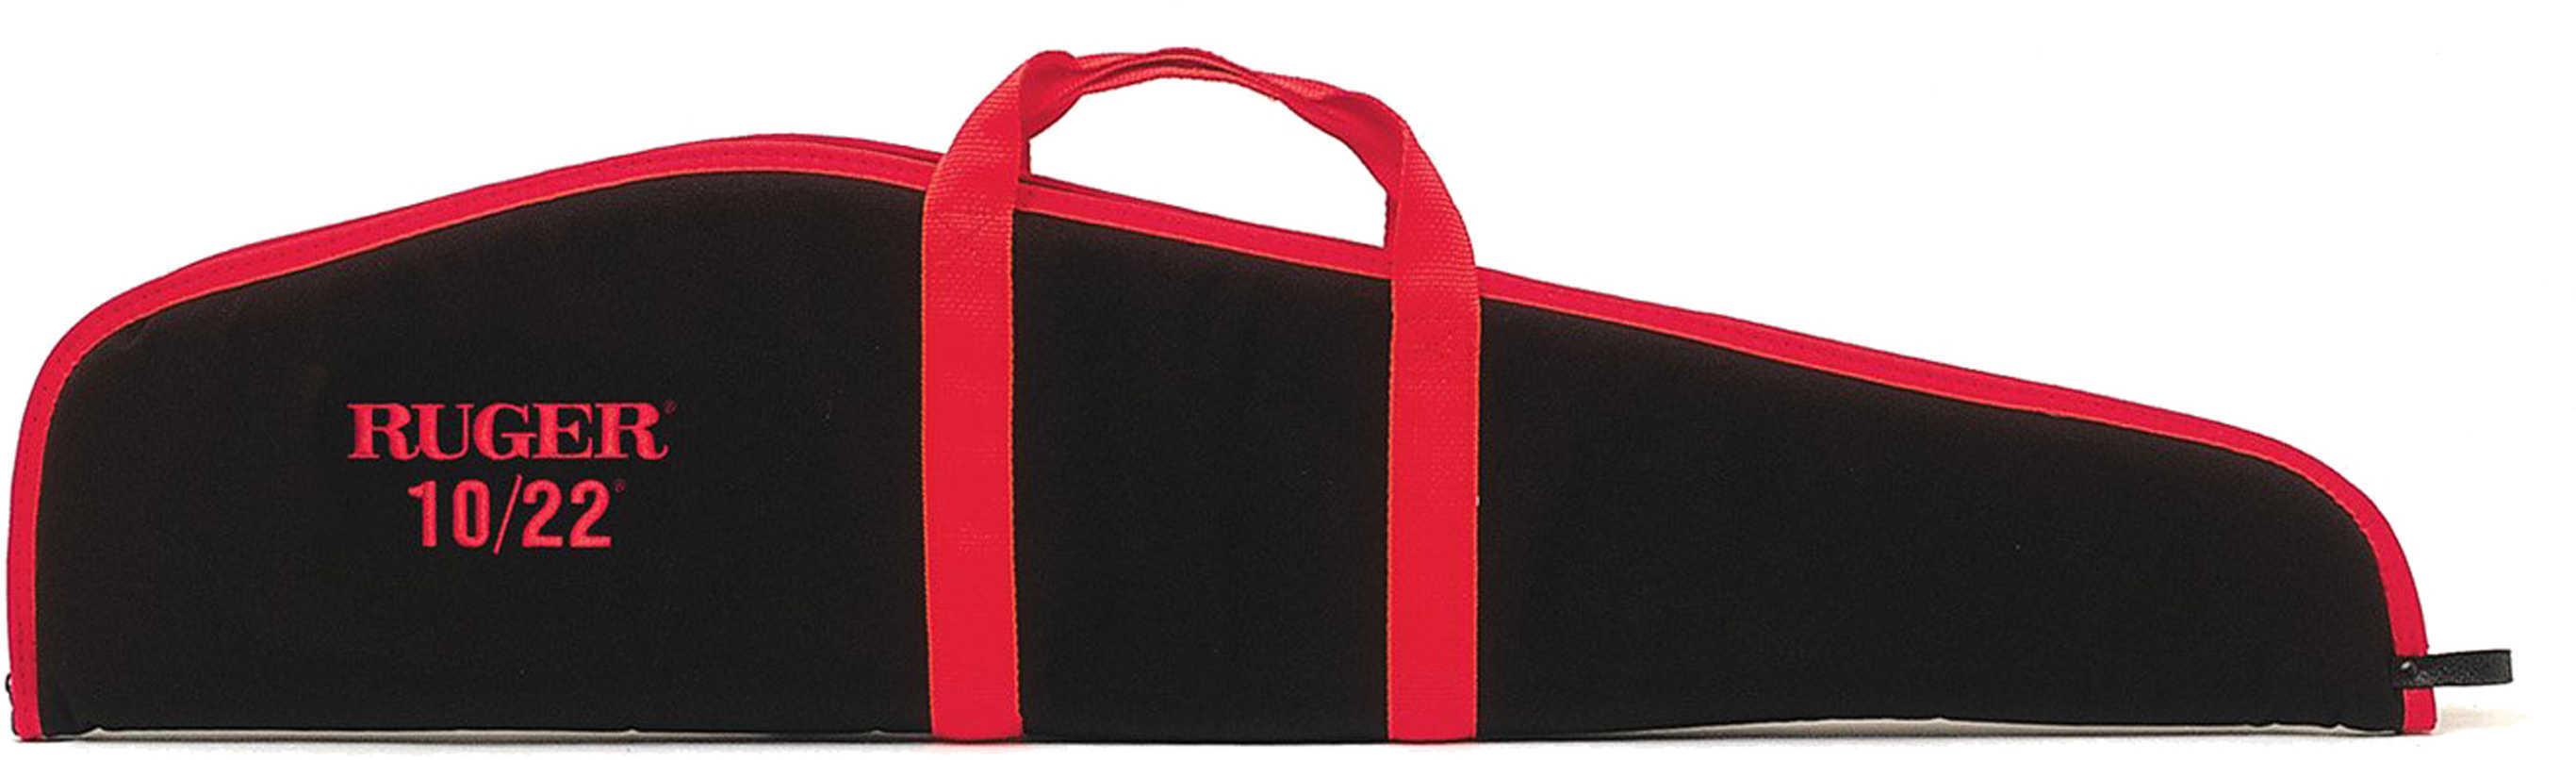 "Allen 27540 Ruger Embroidered 10/22 Rifle Case Black with Red Trim Endura Textured 10"" x 42"" x 1.5"""